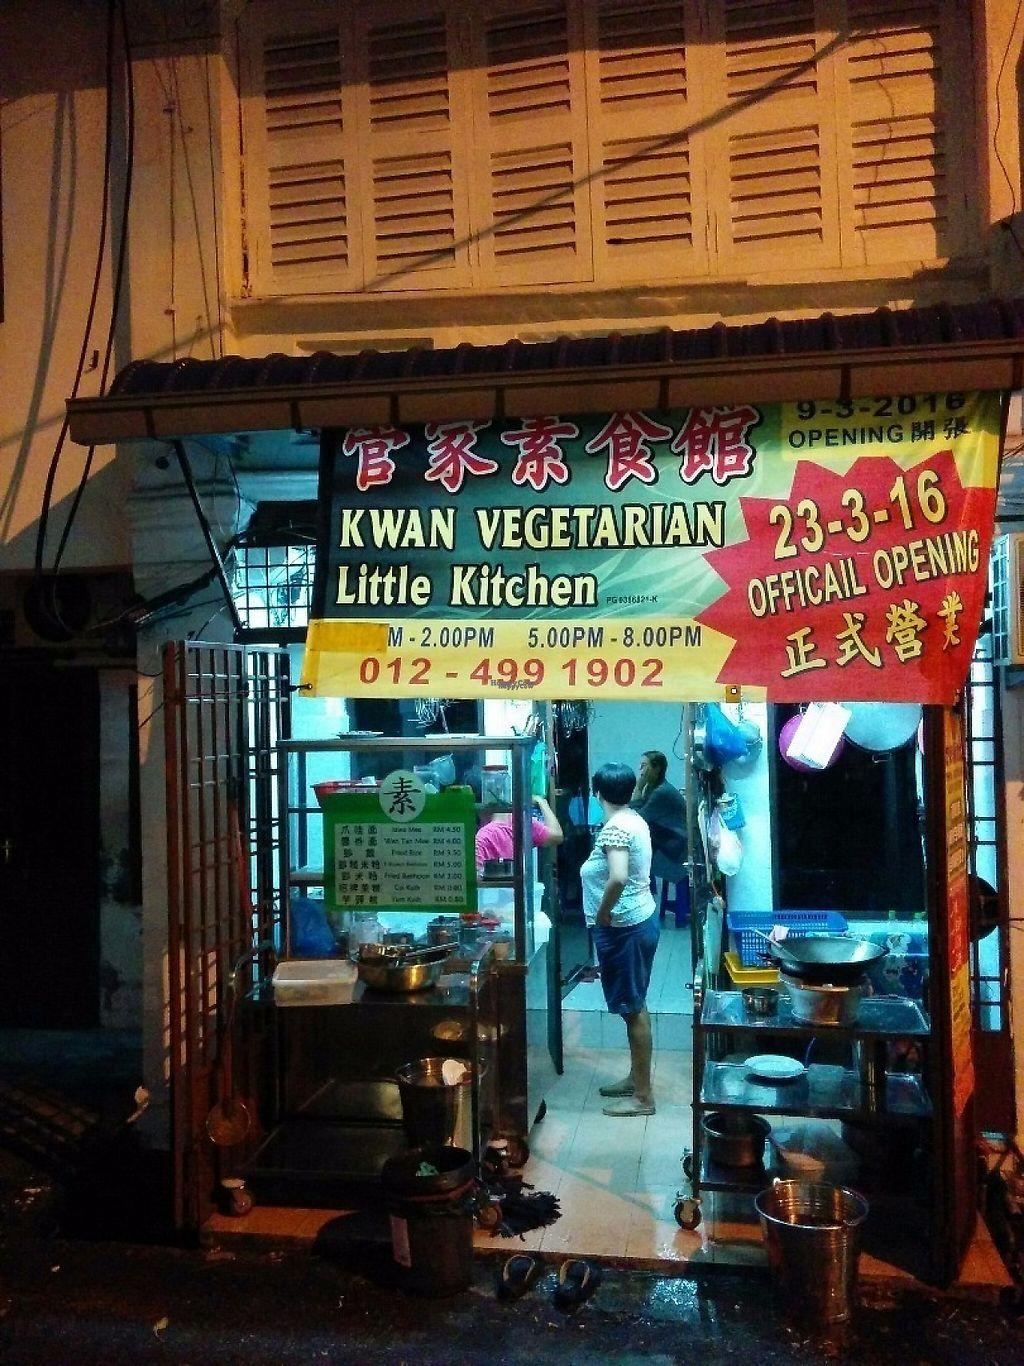 Kwan Vegetarian Little Kitchen